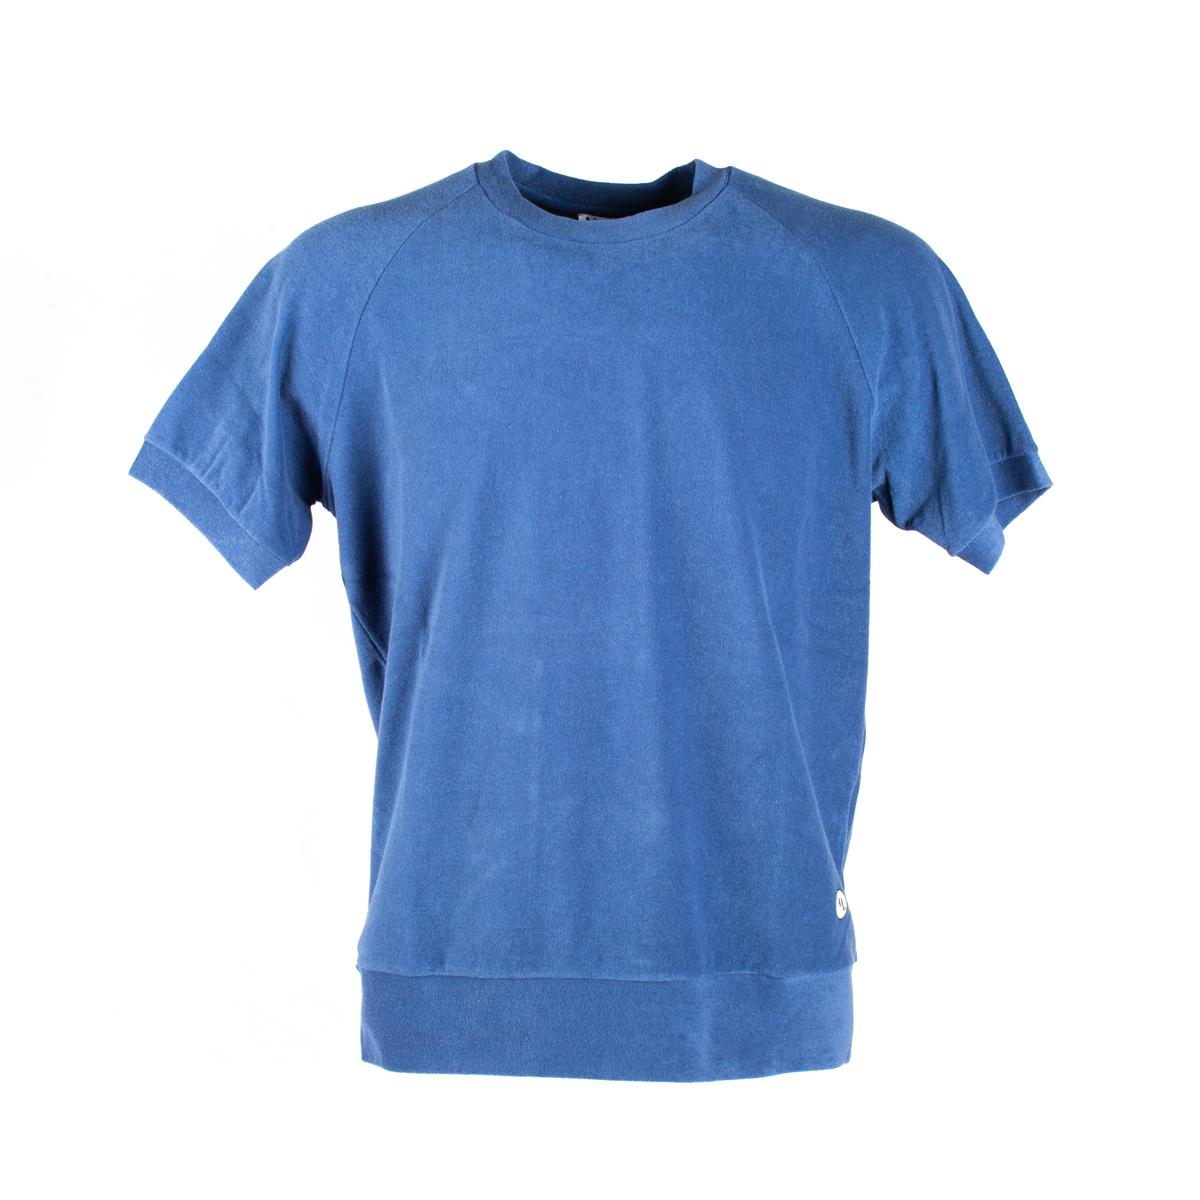 T-Shirt Doppiaa Azzurro Intenso